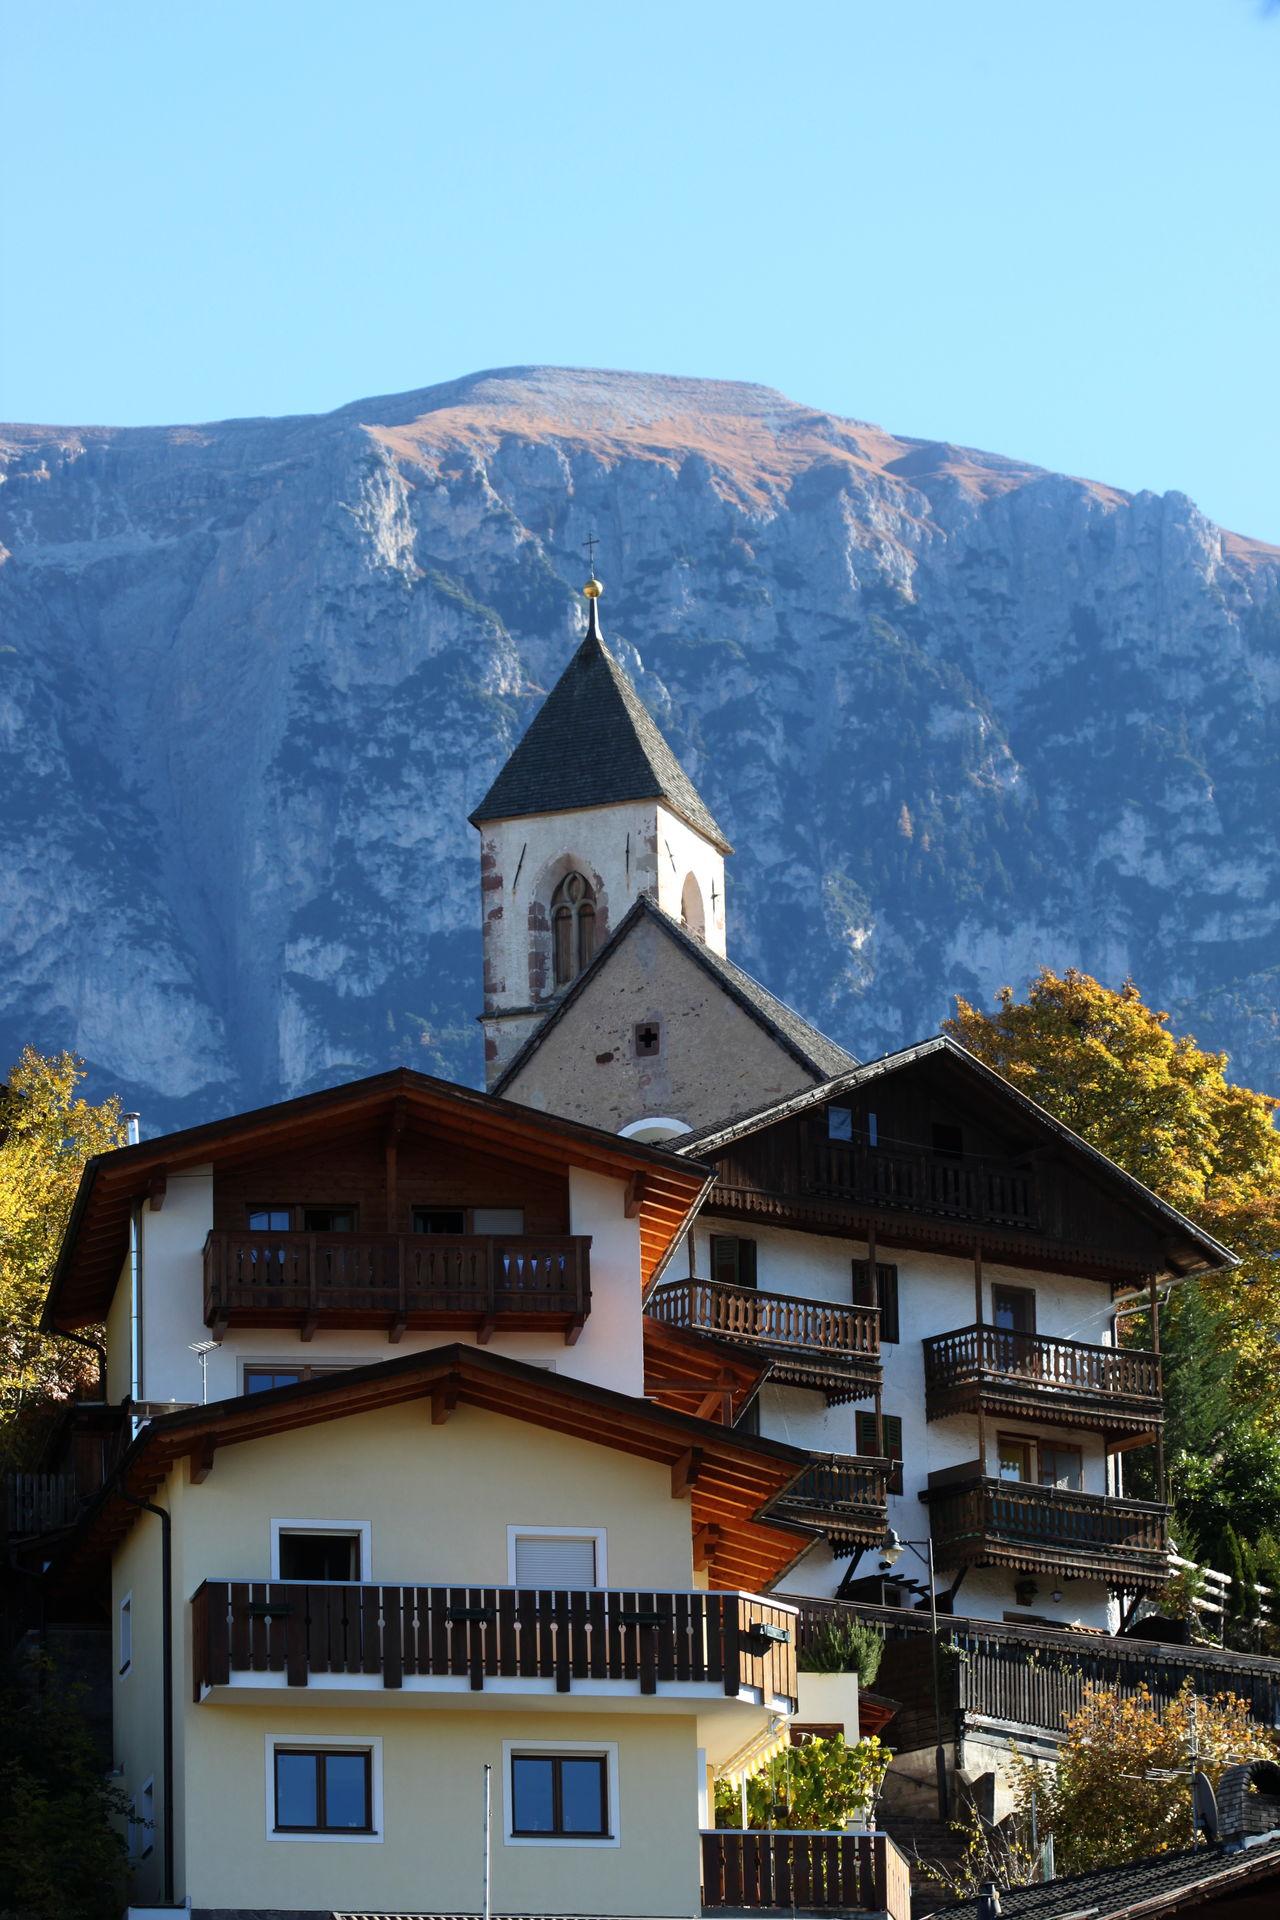 Balconies Blue Sky Church Dolomites Fiè Allo Sciliar Houses Italy Mountain Südtirol Trees Windows